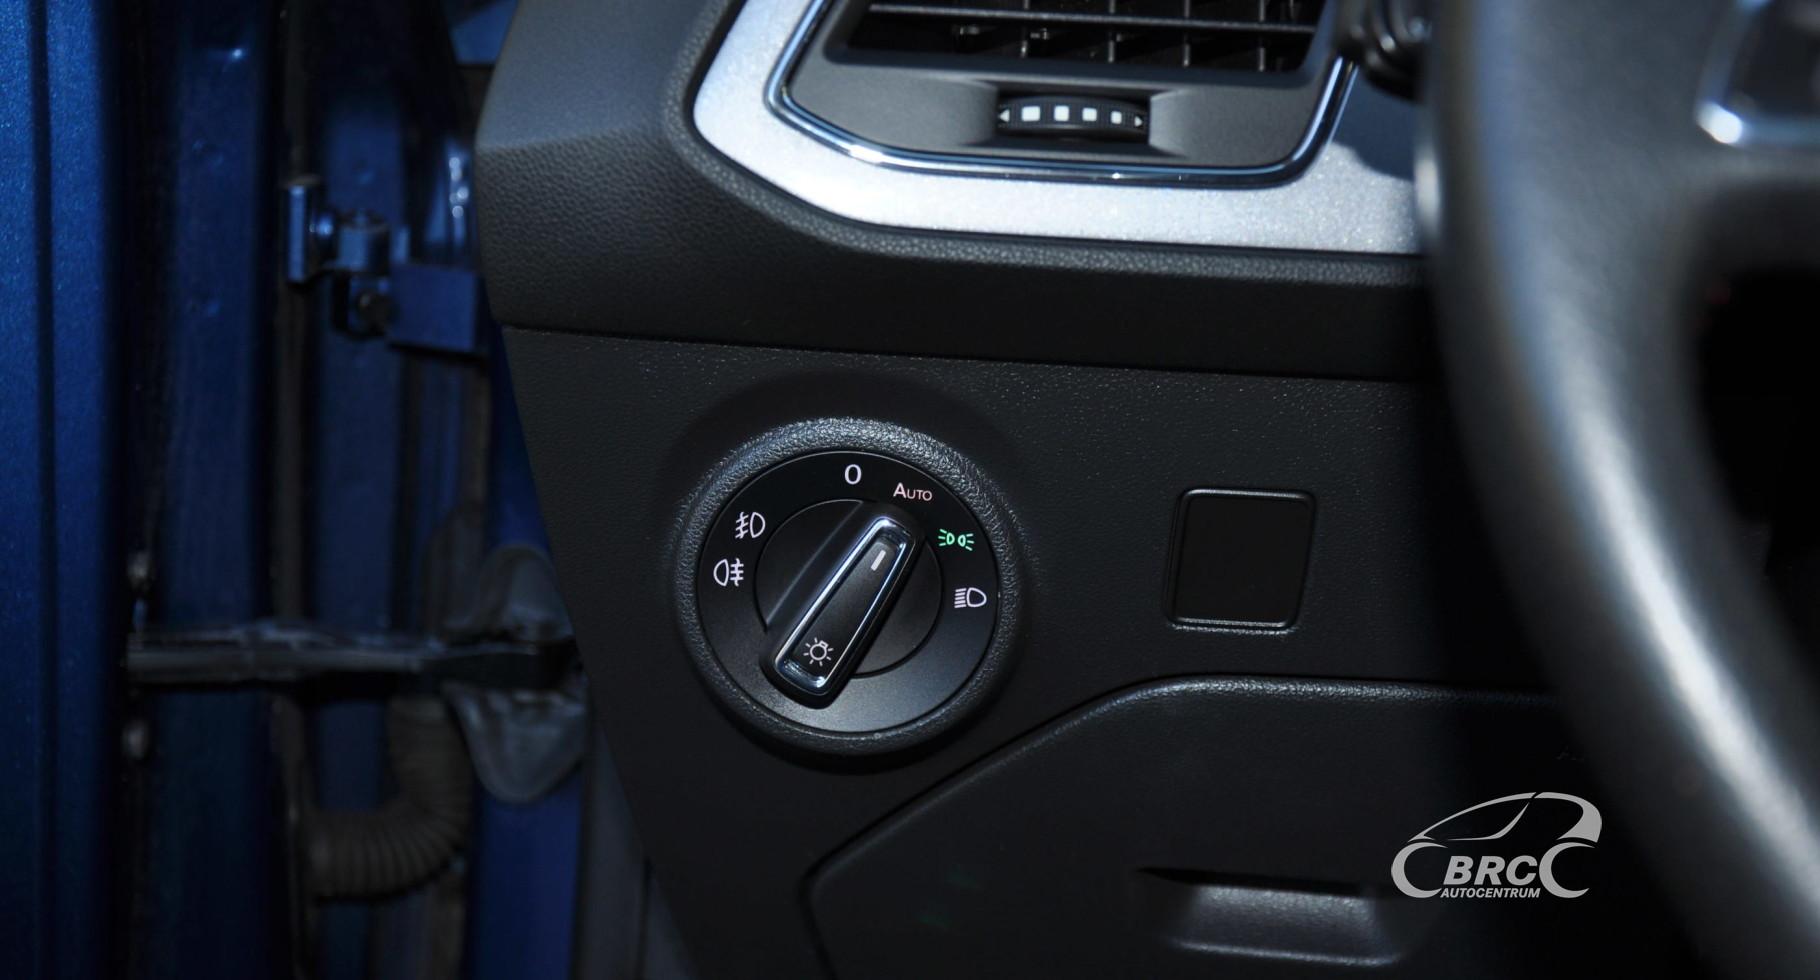 Seat Leon 2.0 TDI FR Automatas